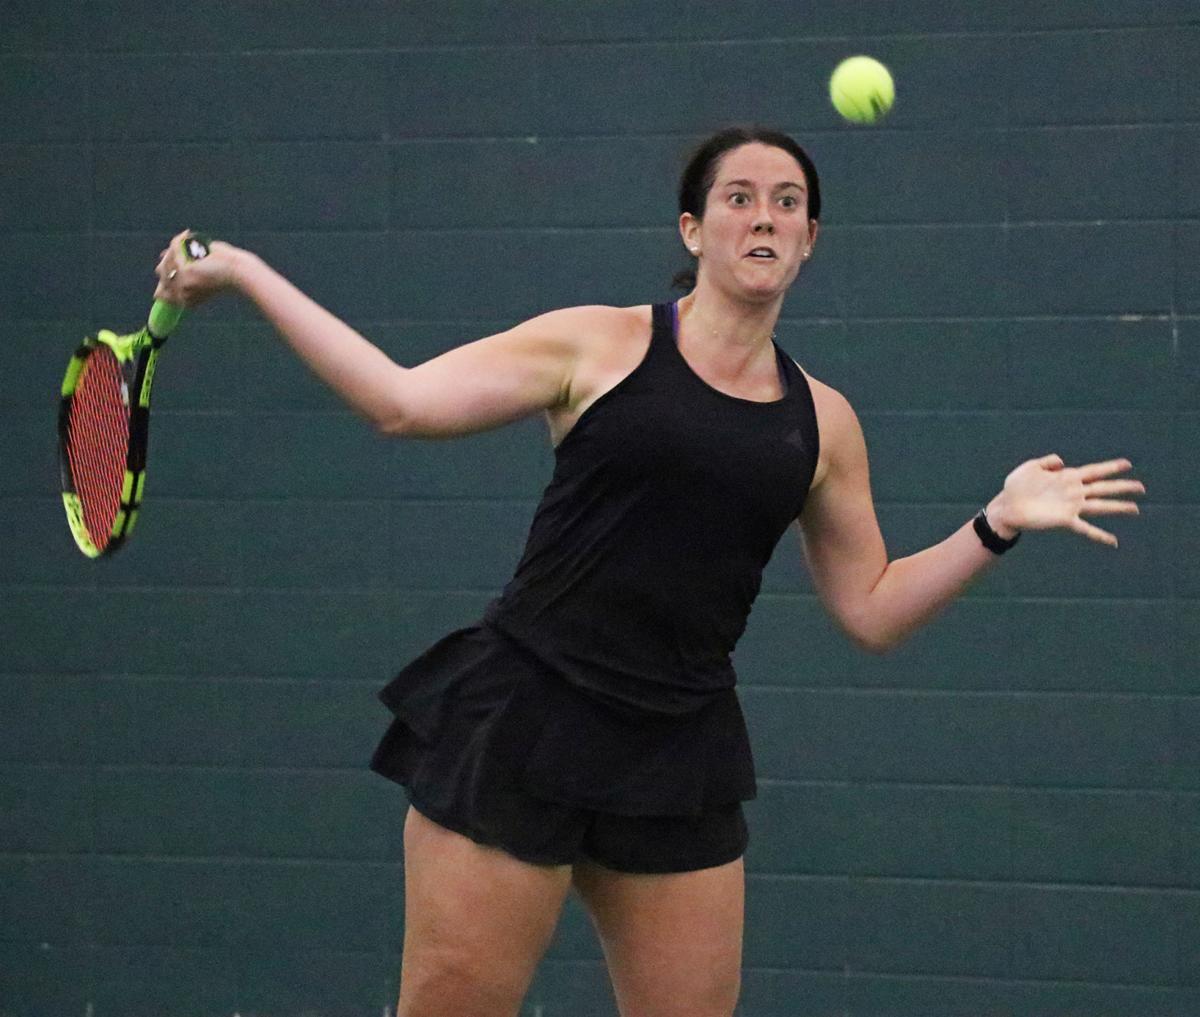 Senior Phoebe Boeschen swings to hit the ball